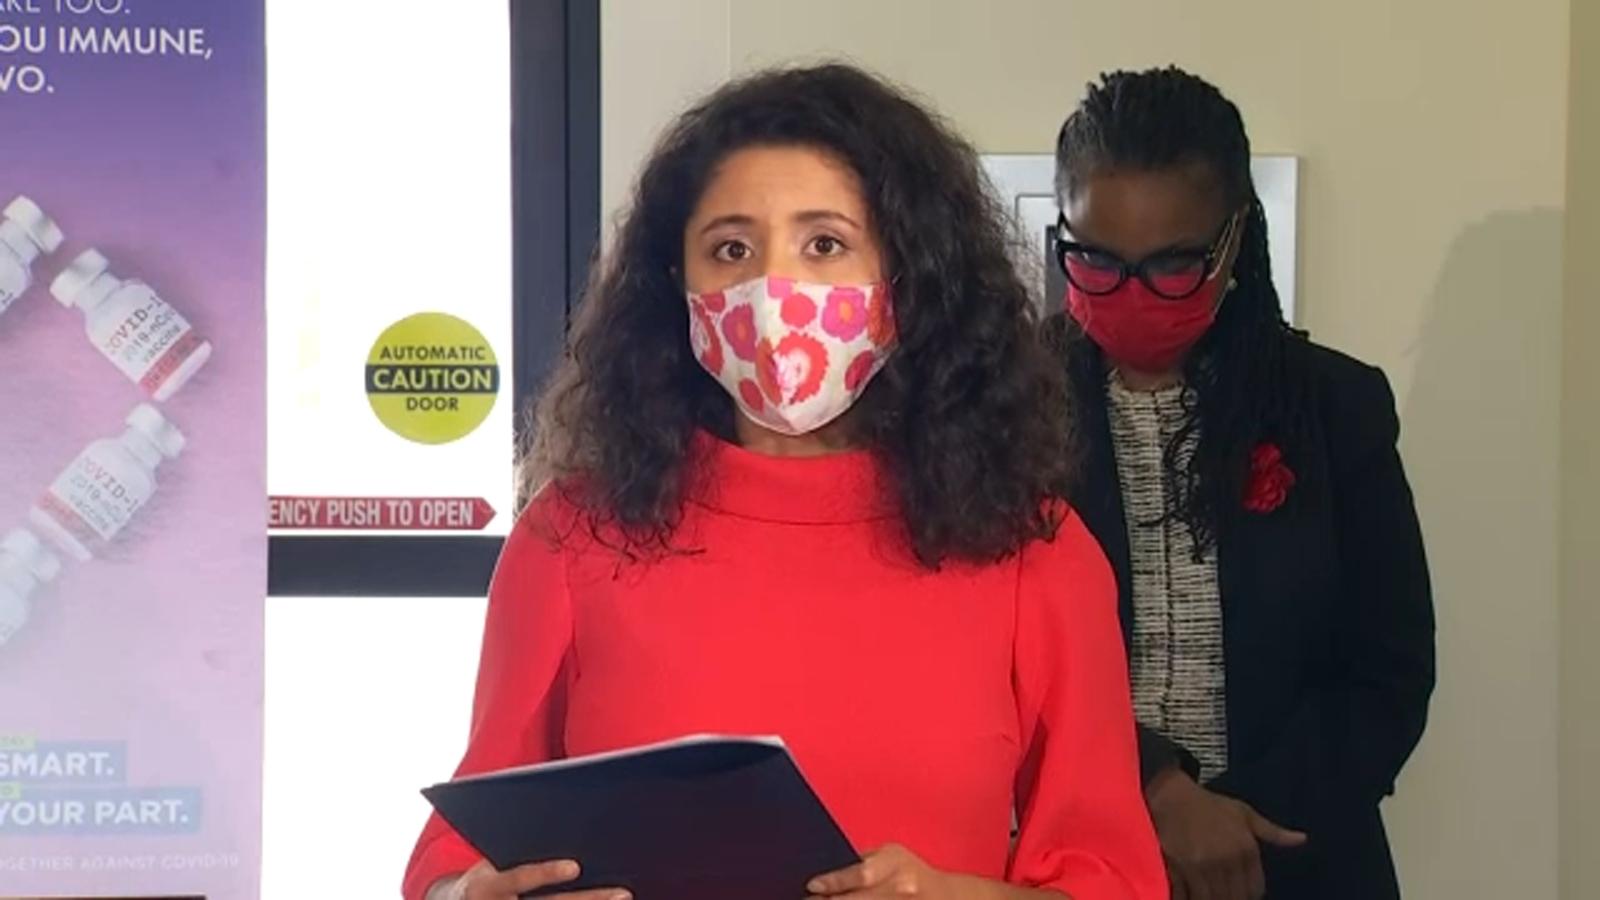 Harris Co. Judge Lina Hidalgo announces new 'Stay Smart, Do Your Part' vaccine campaign - KTRK-TV